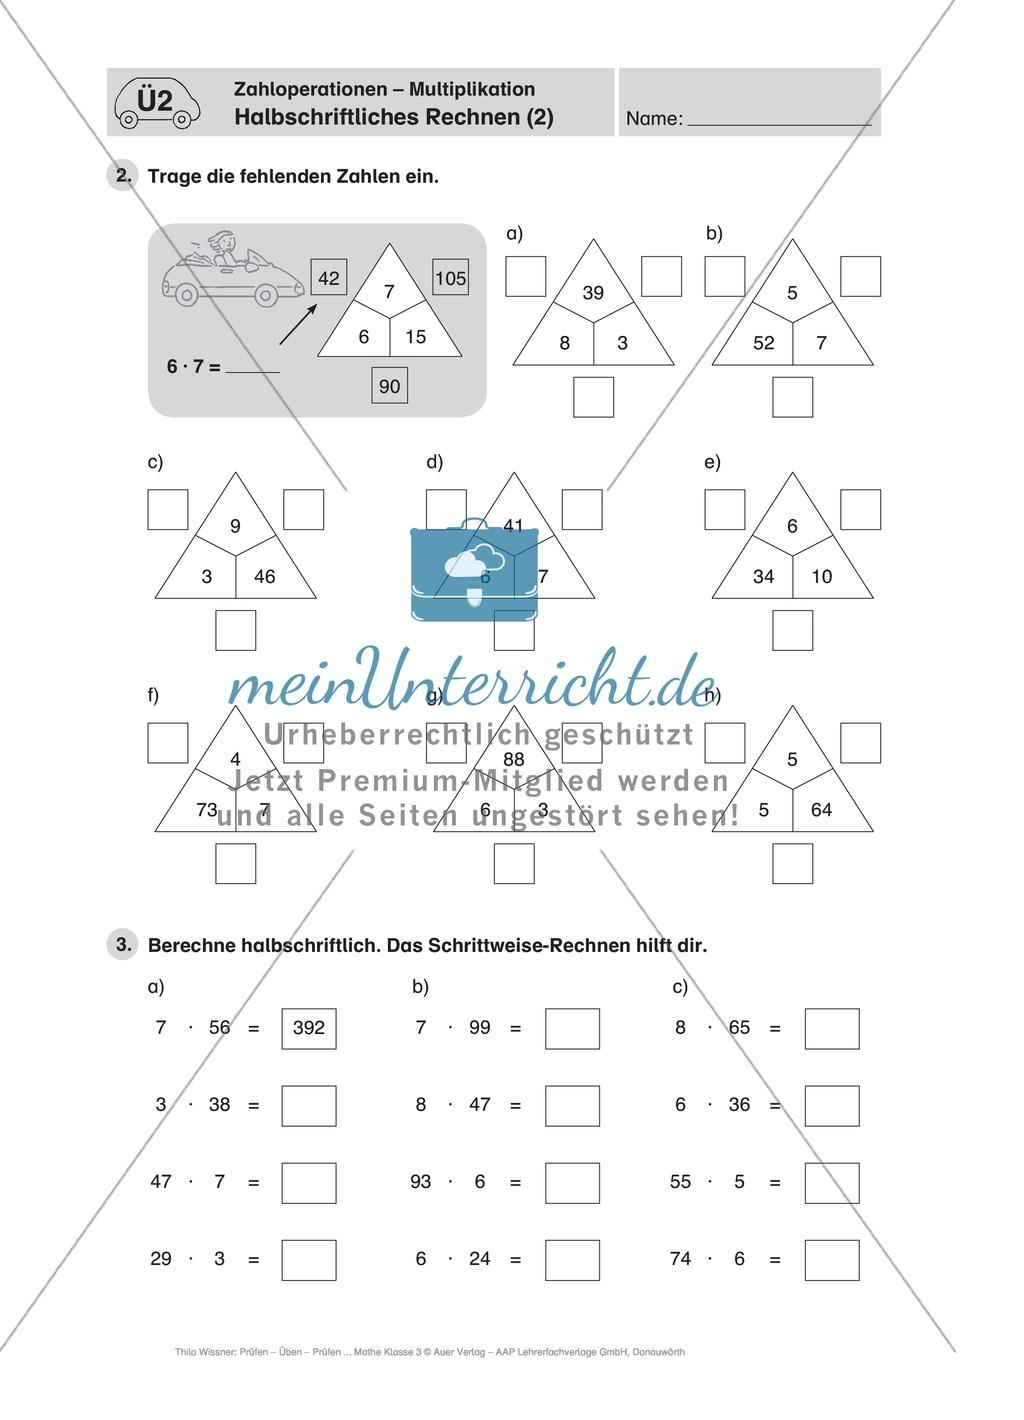 Mathefahrschule: Zahlenoperationen bis 1000 - Multiplikation ...